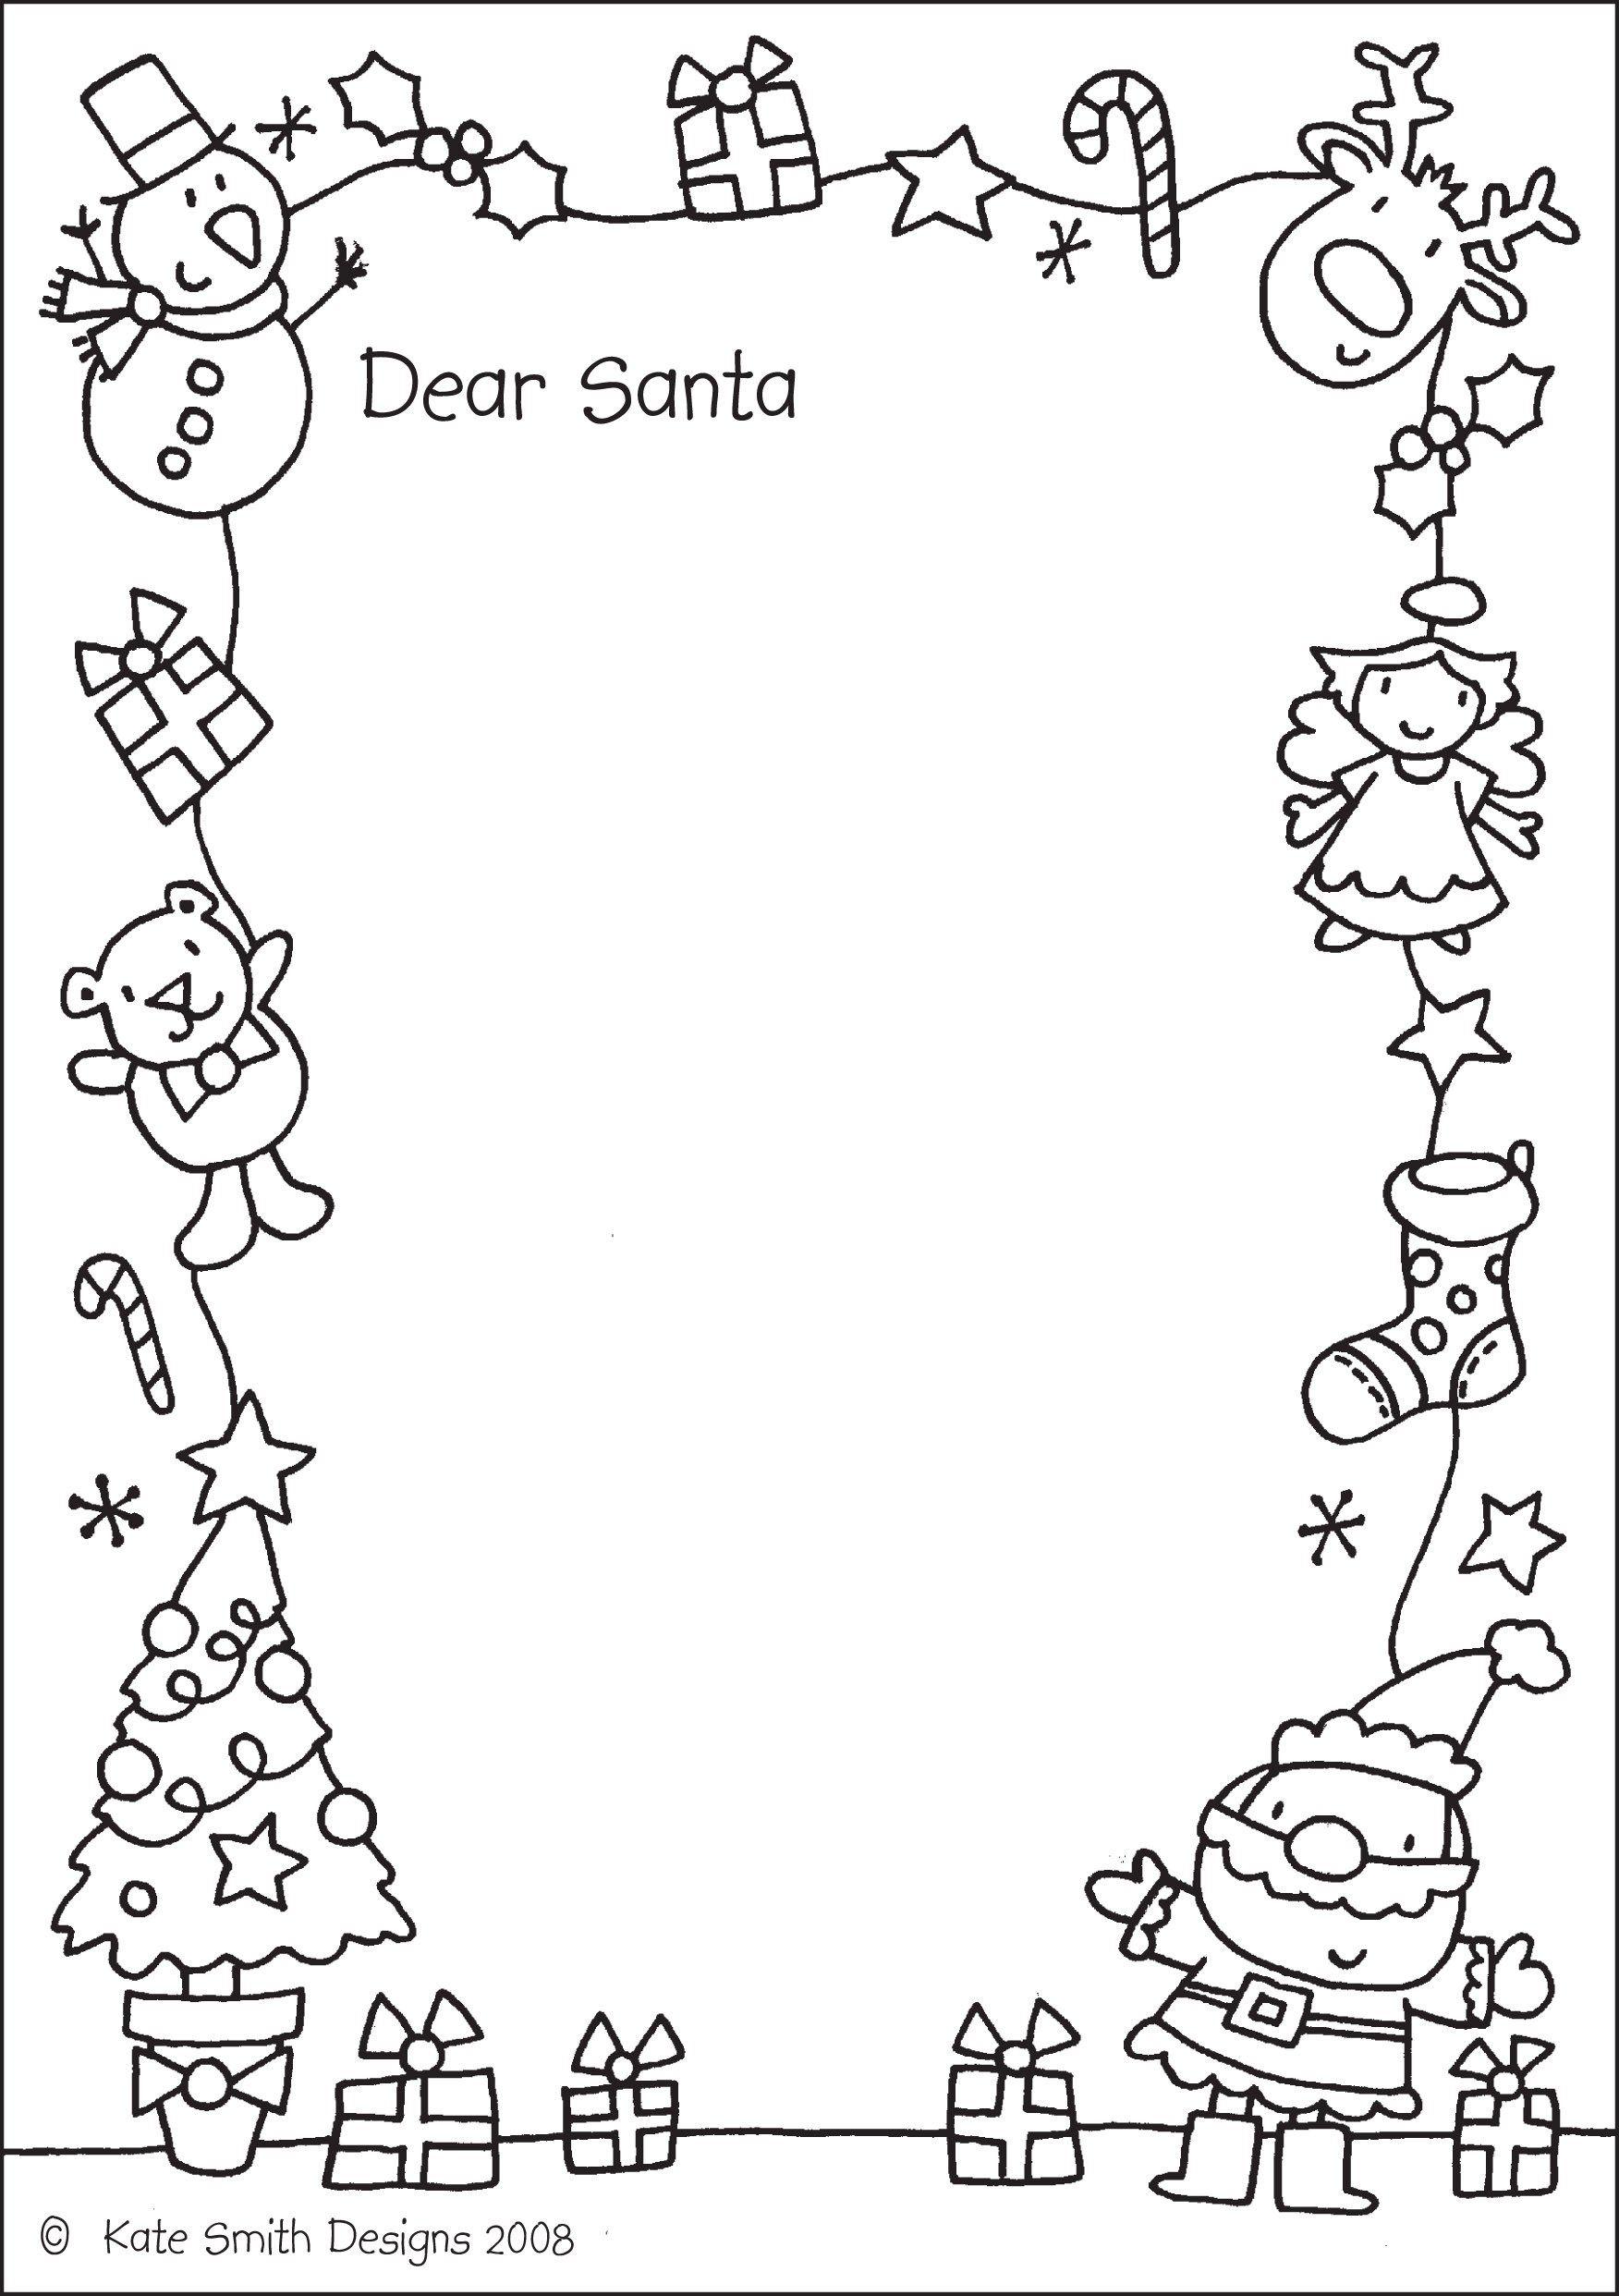 Printable Christmas Letter To Santa Claus Write Template